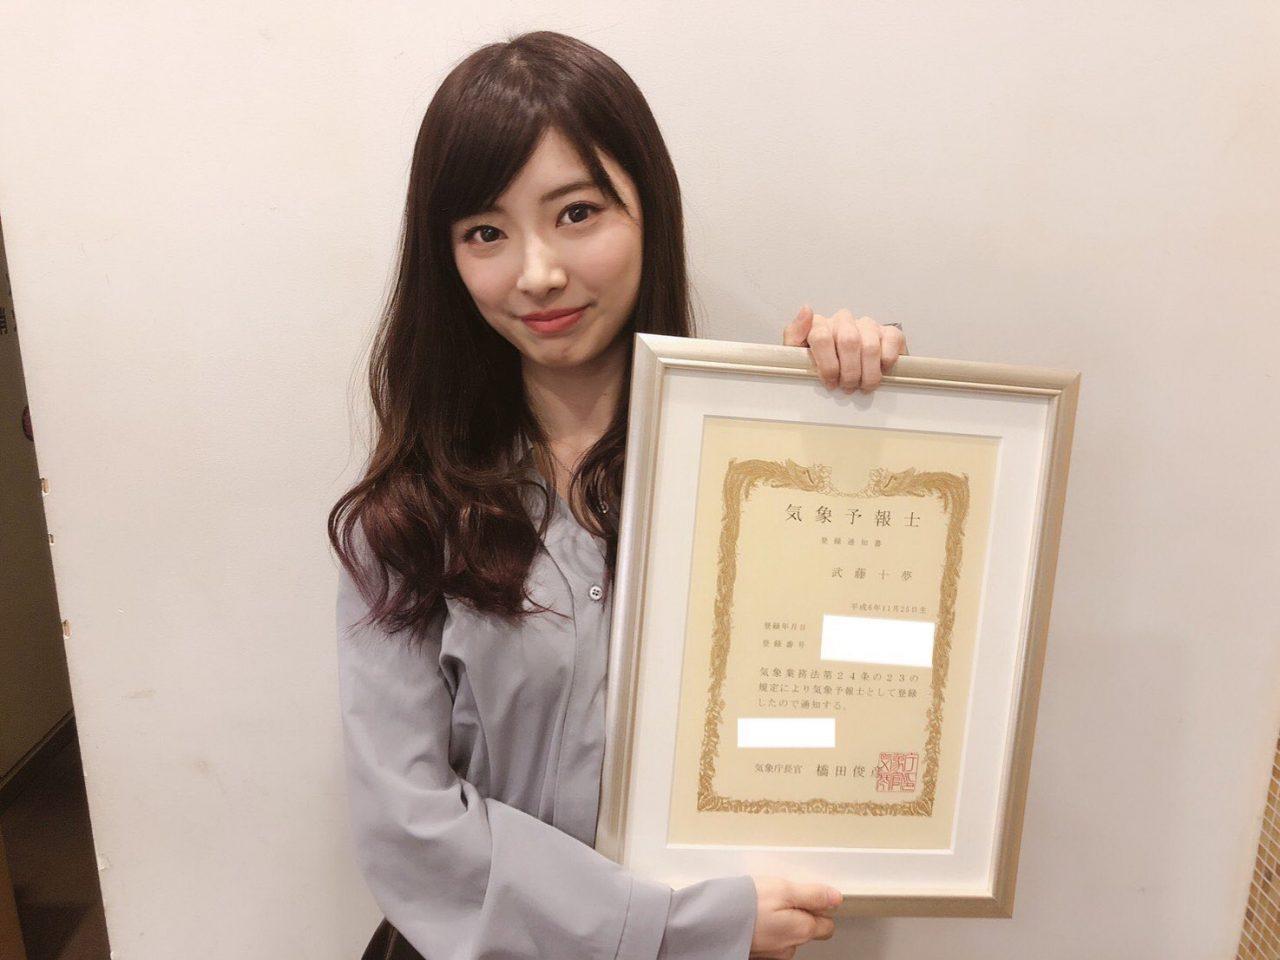 AKB48 武藤十夢、気象予報士の国家試験に合格!「5年間頑張って本当によかった、、☆」